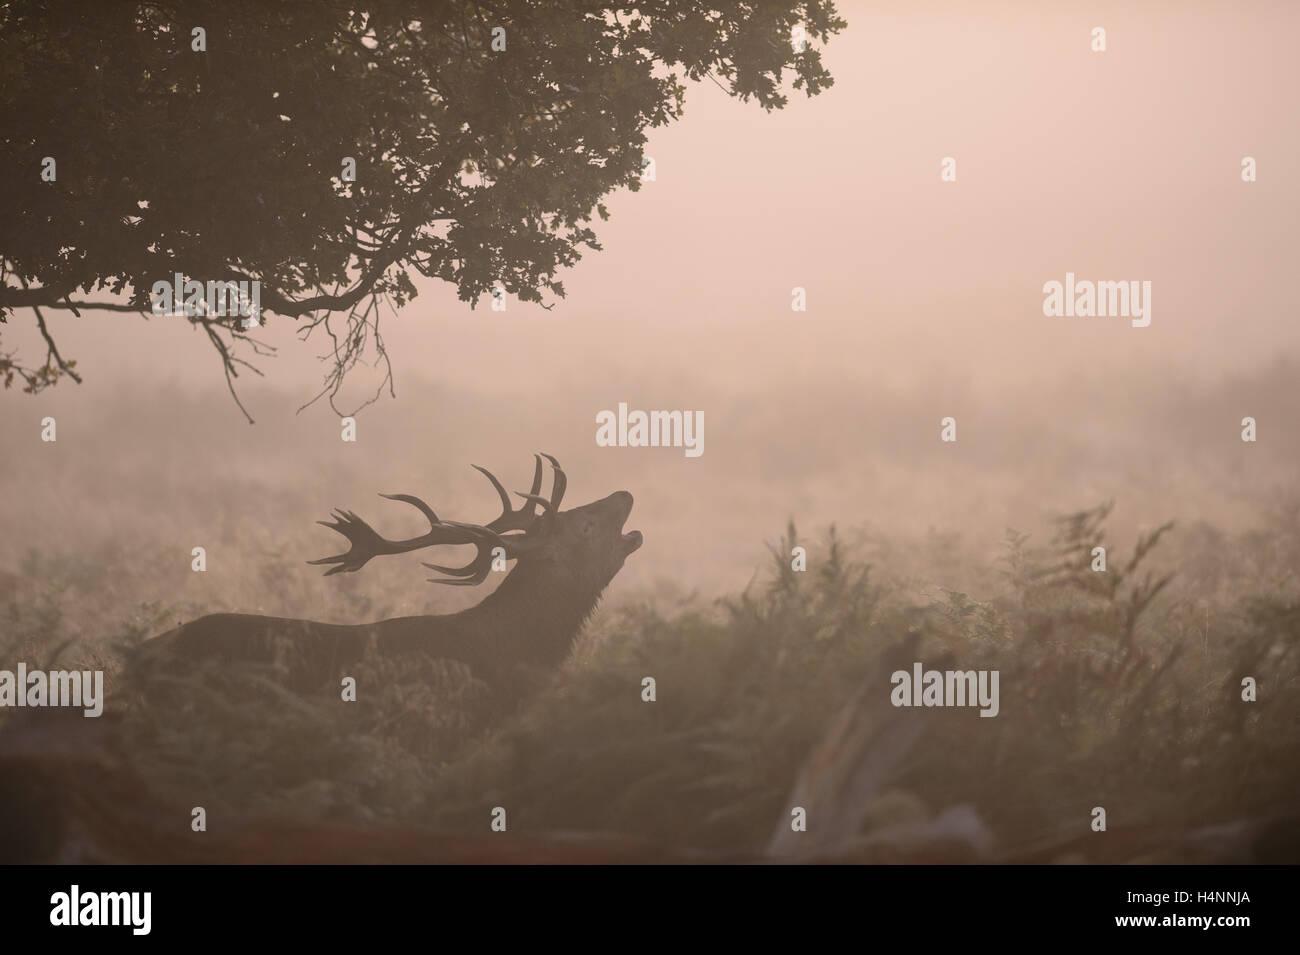 Rotwild-Hirsch ruft im Nebel am frühen Morgen bei Sonnenaufgang, Richmond Park, London, UK. Stockbild